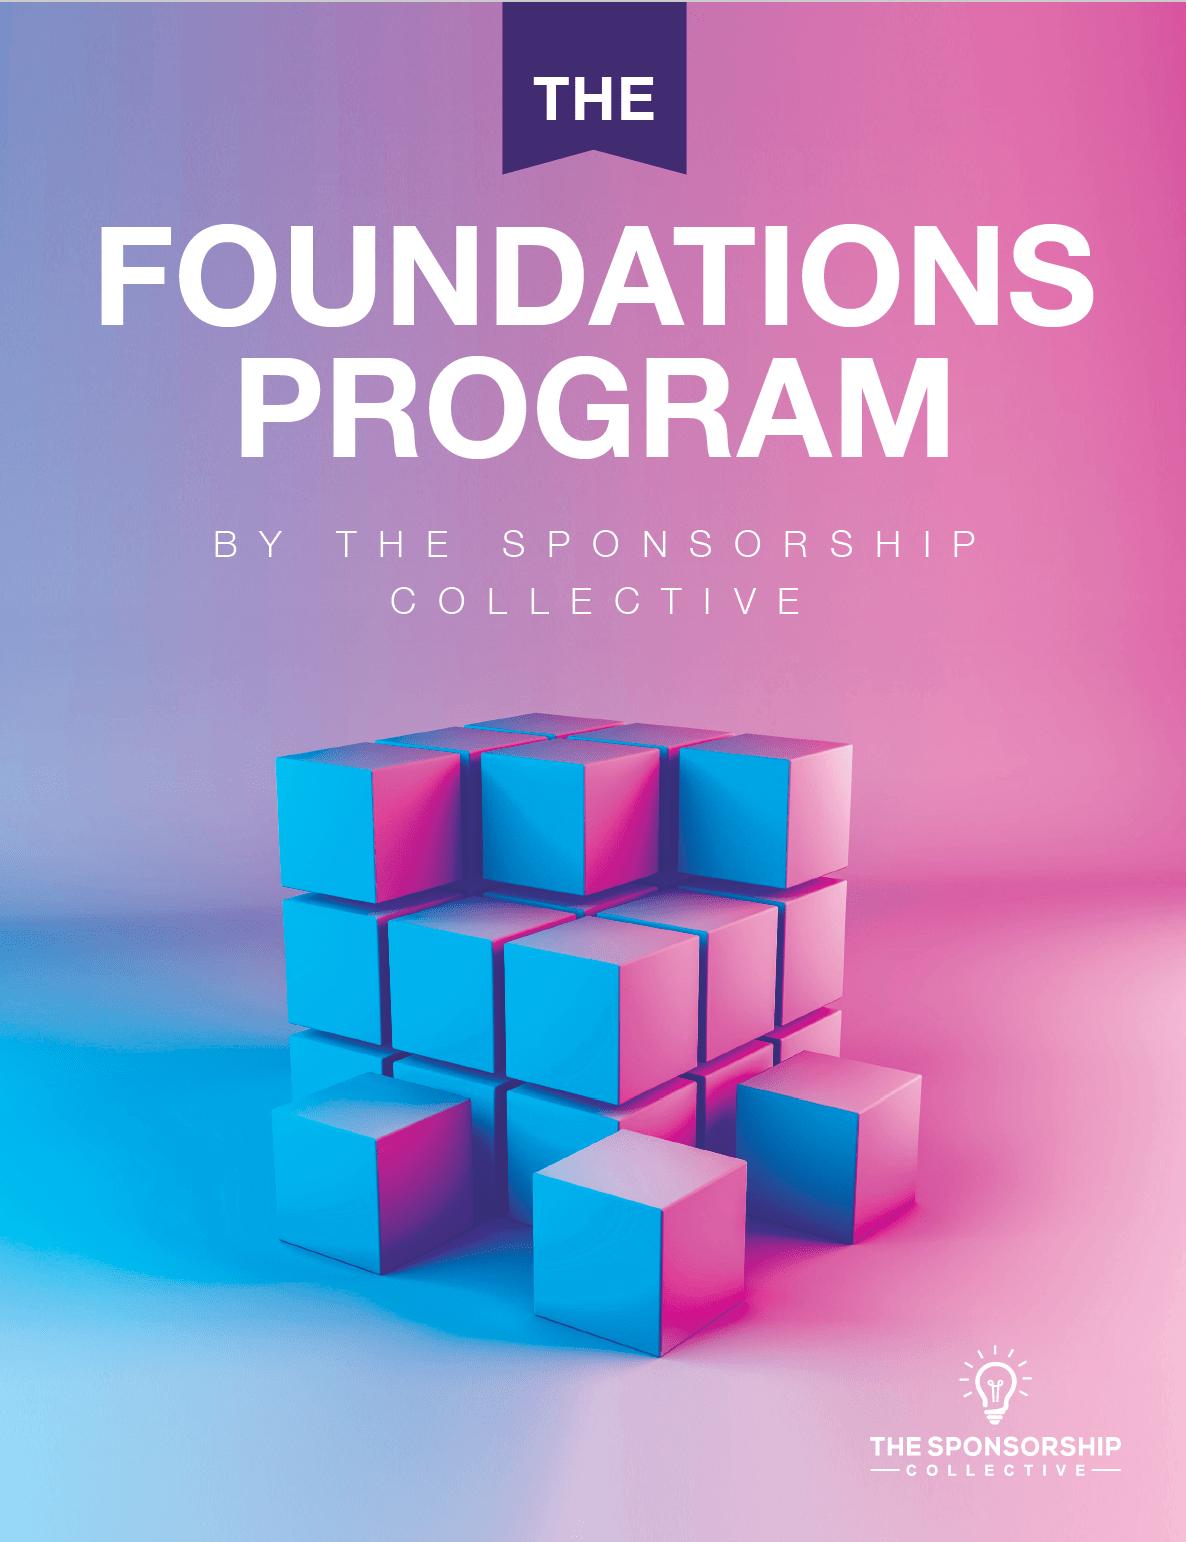 TheFoundations Program